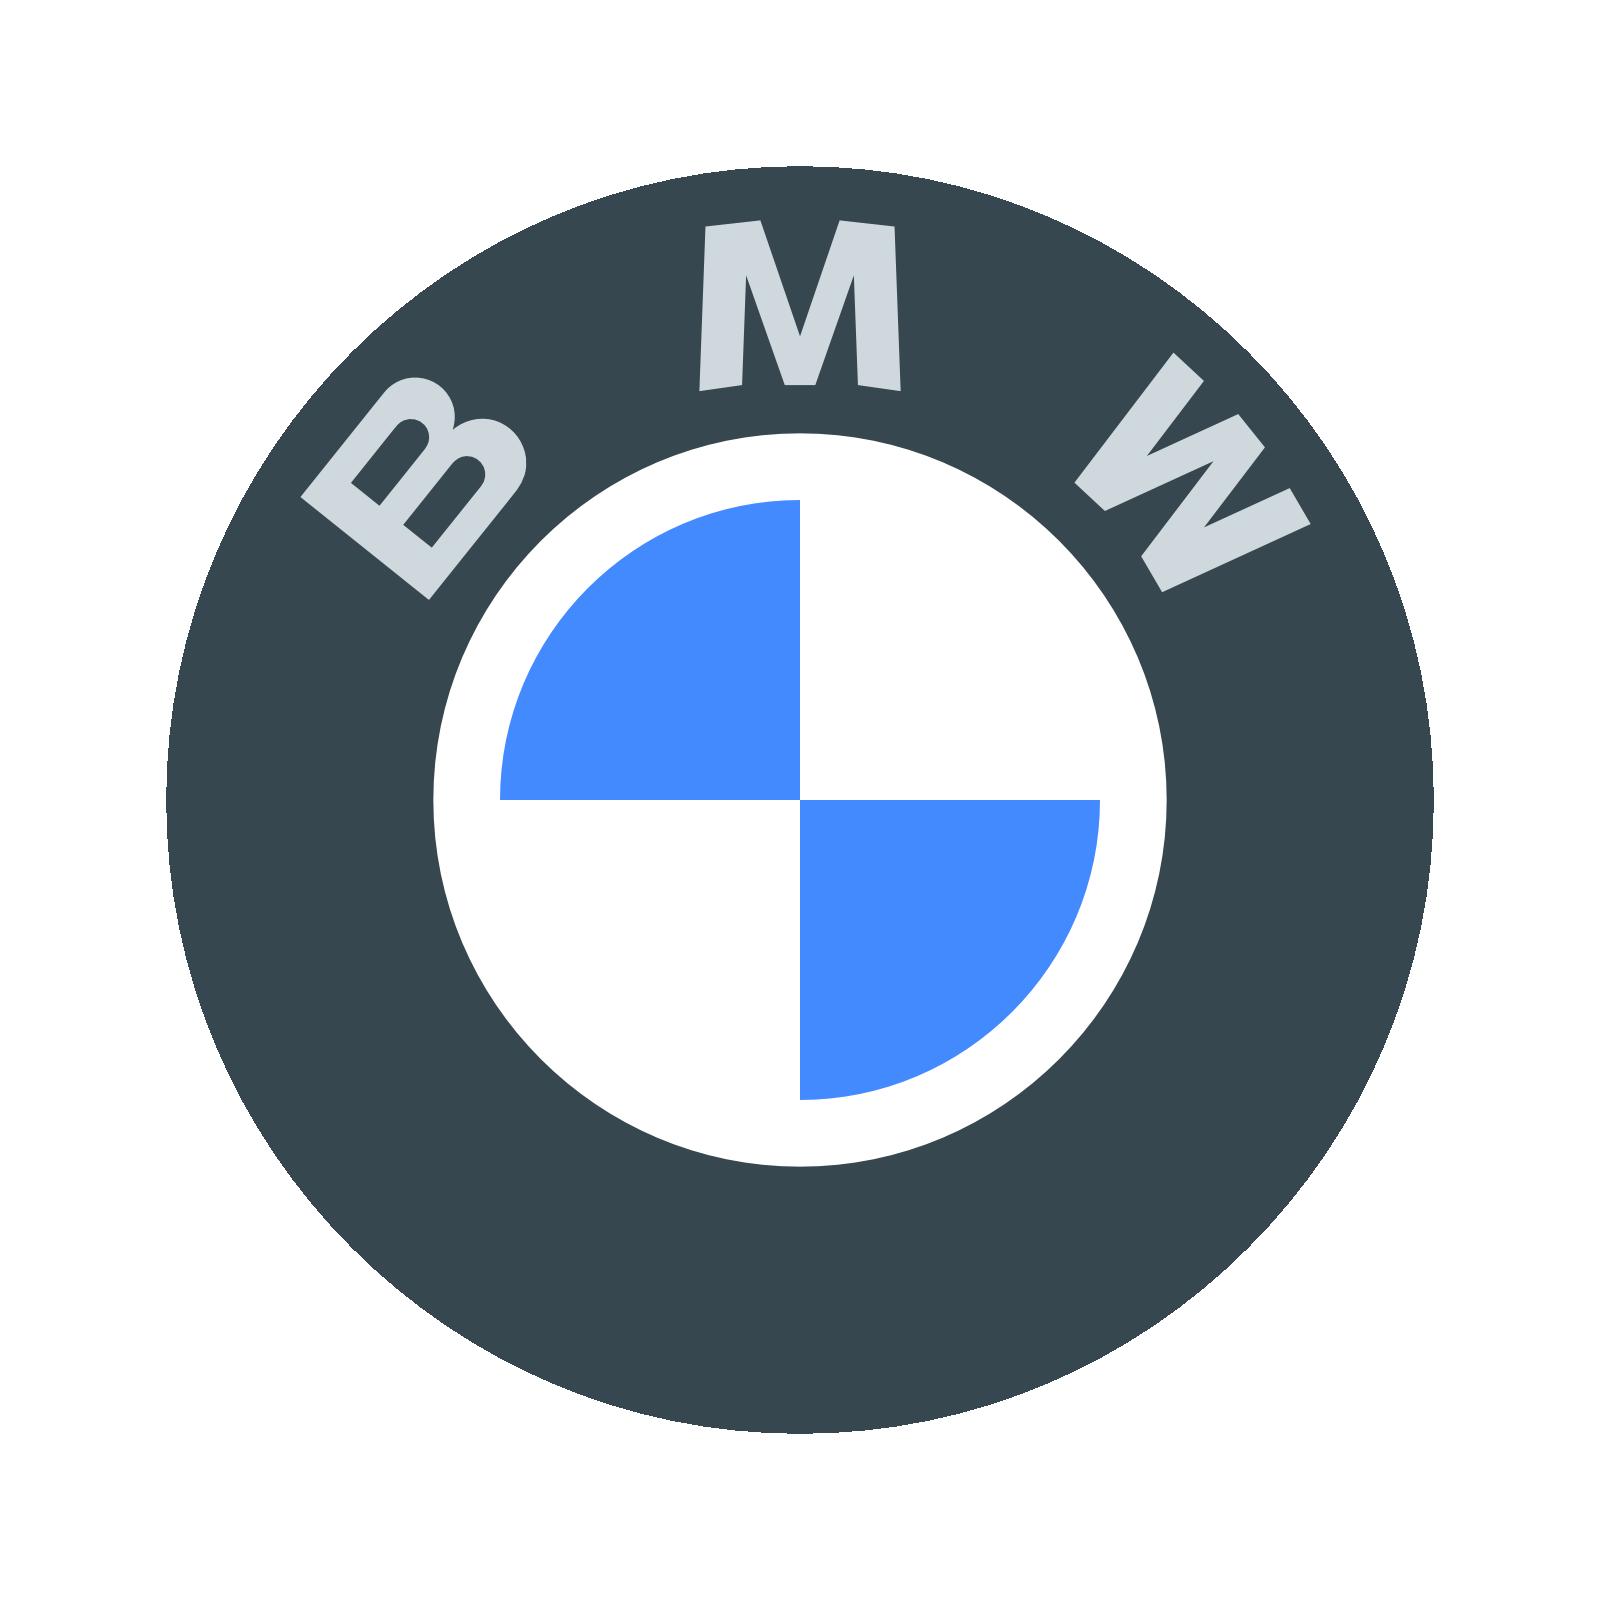 Bmw Flat Vector PNG - 37753